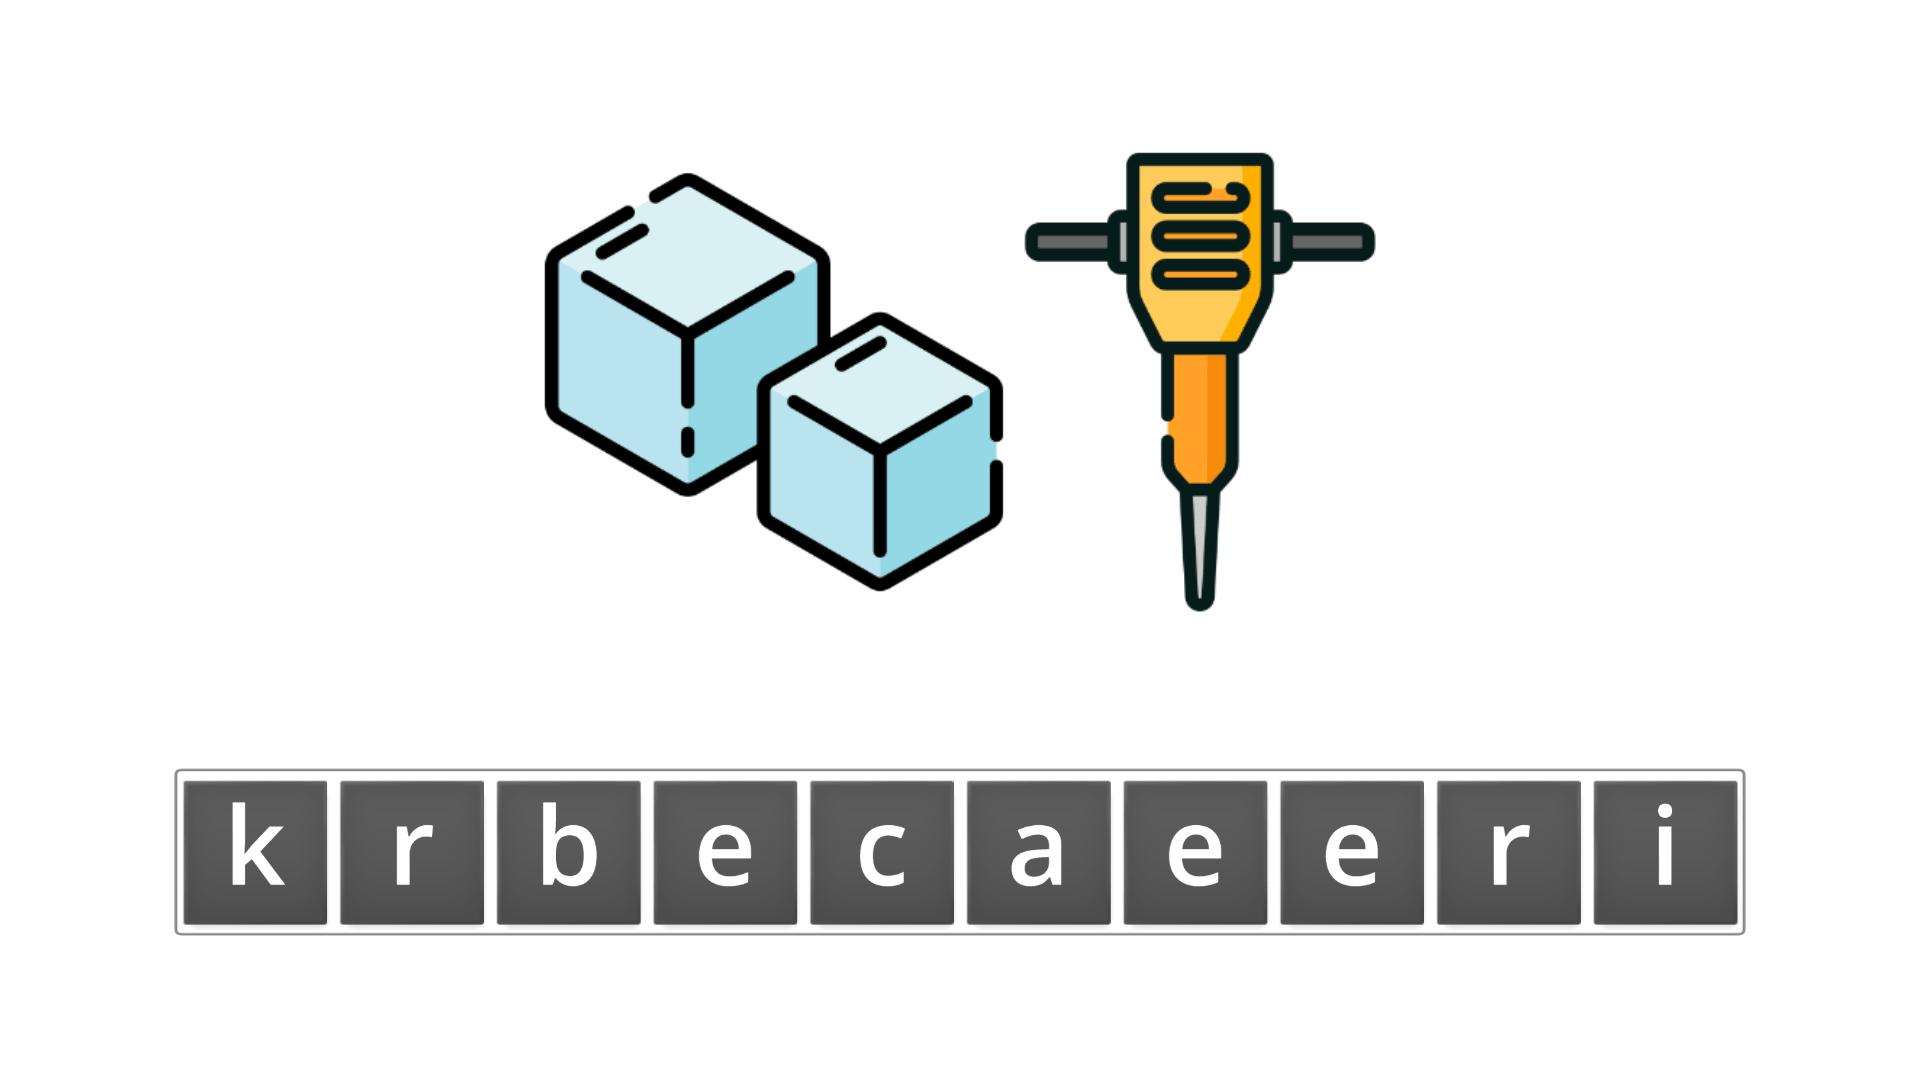 esl resources - flashcards - compound nouns  - unscramble - icebreaker